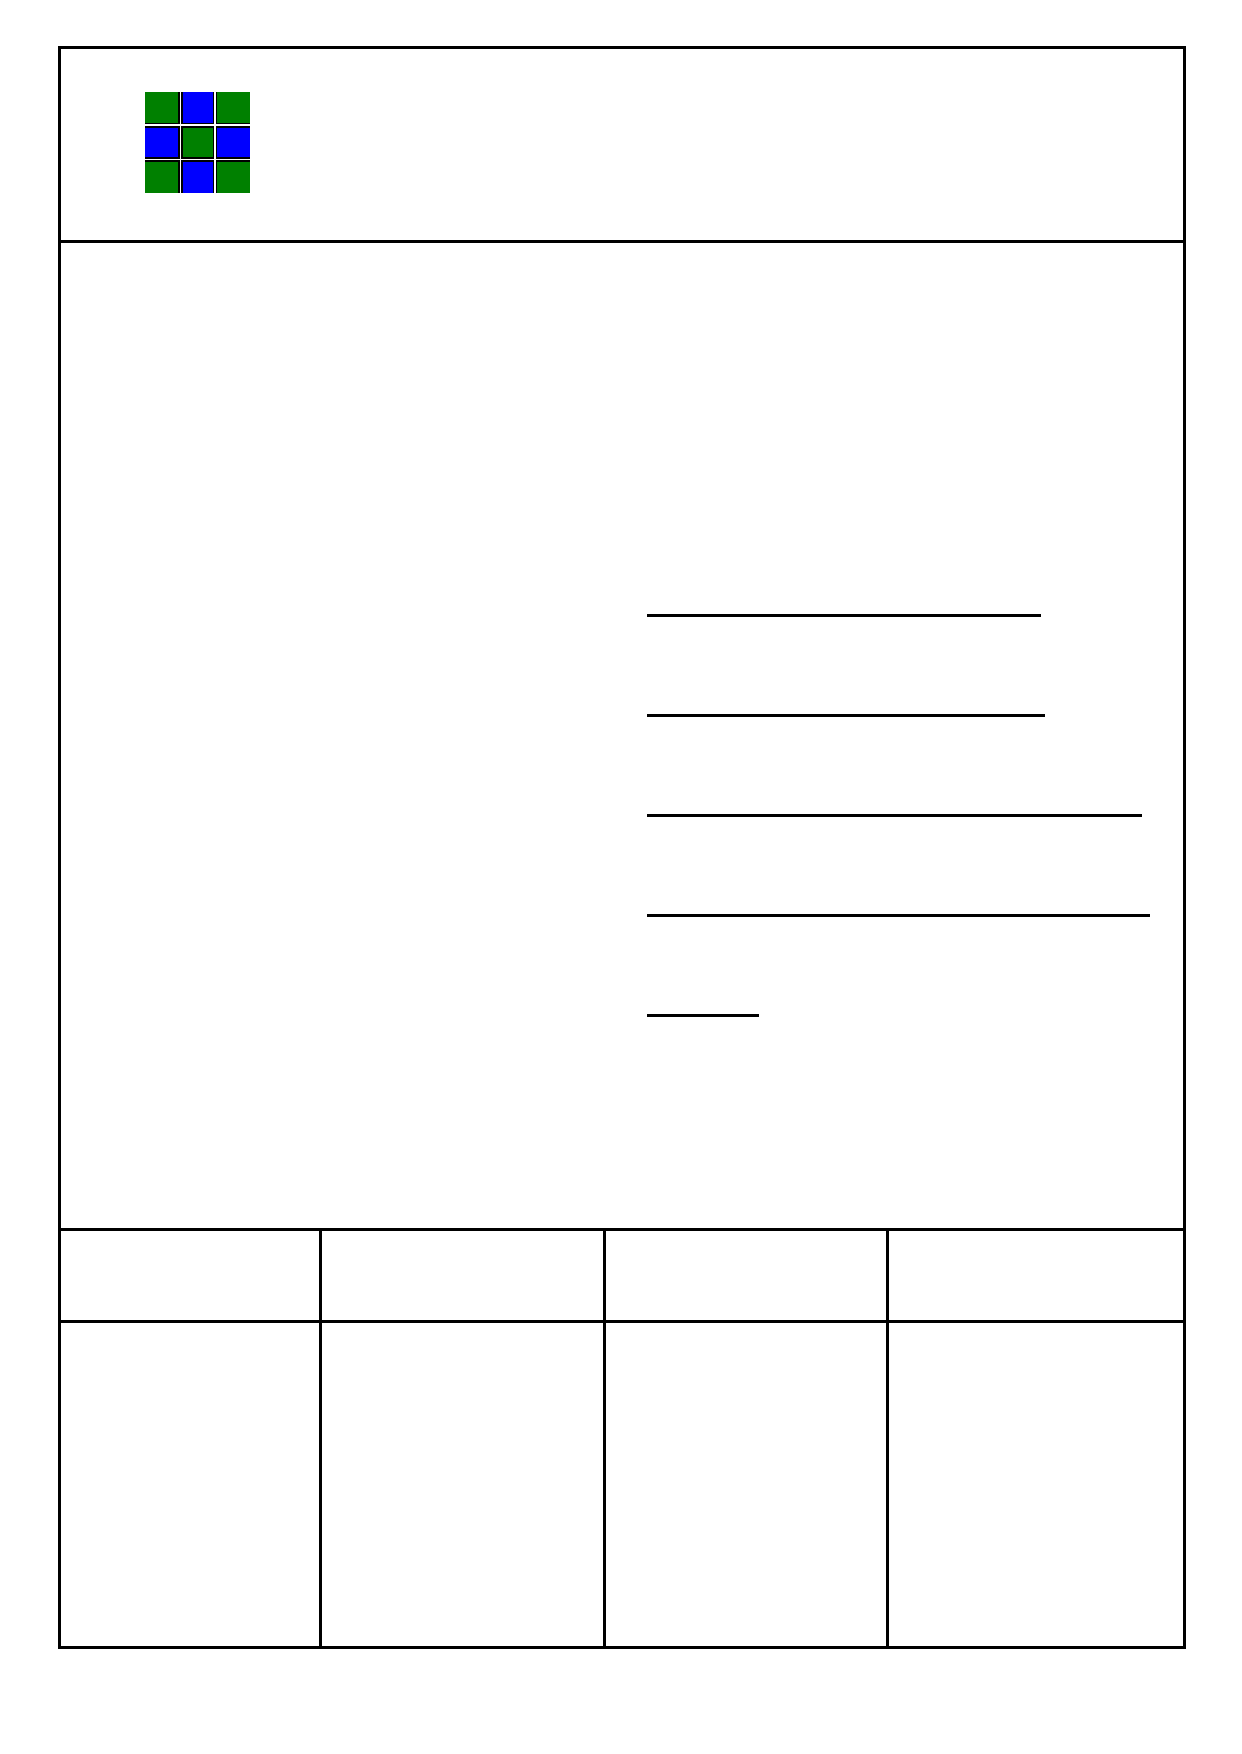 PG320240FRM-CNNiYL 데이터시트 및 PG320240FRM-CNNiYL PDF